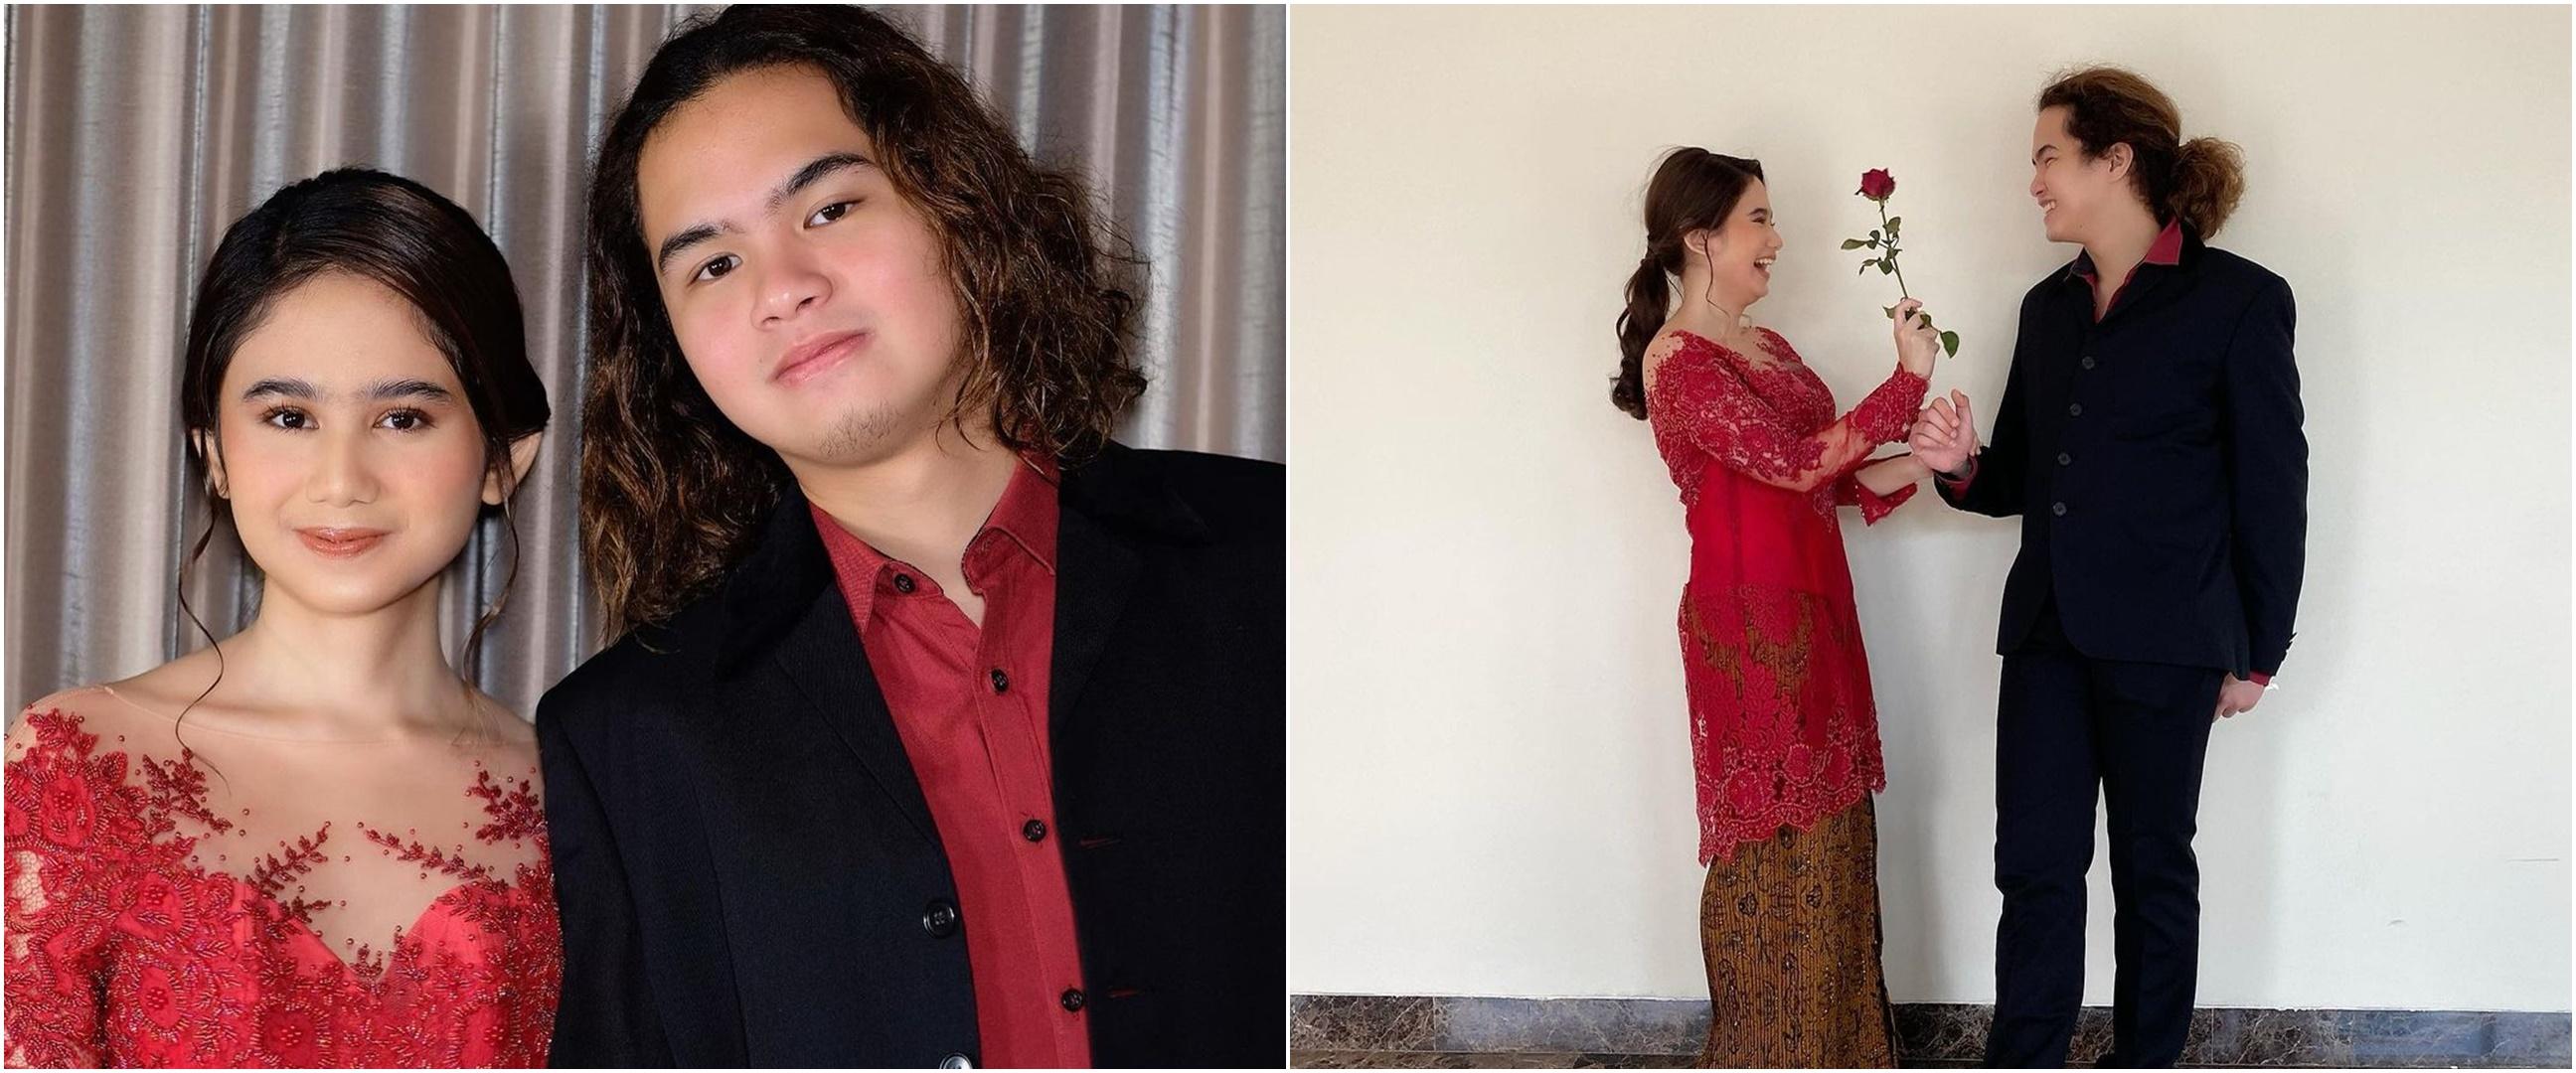 7 Potret Tissa Biani dan Dul Jaelani kondangan bareng, tampil kompak